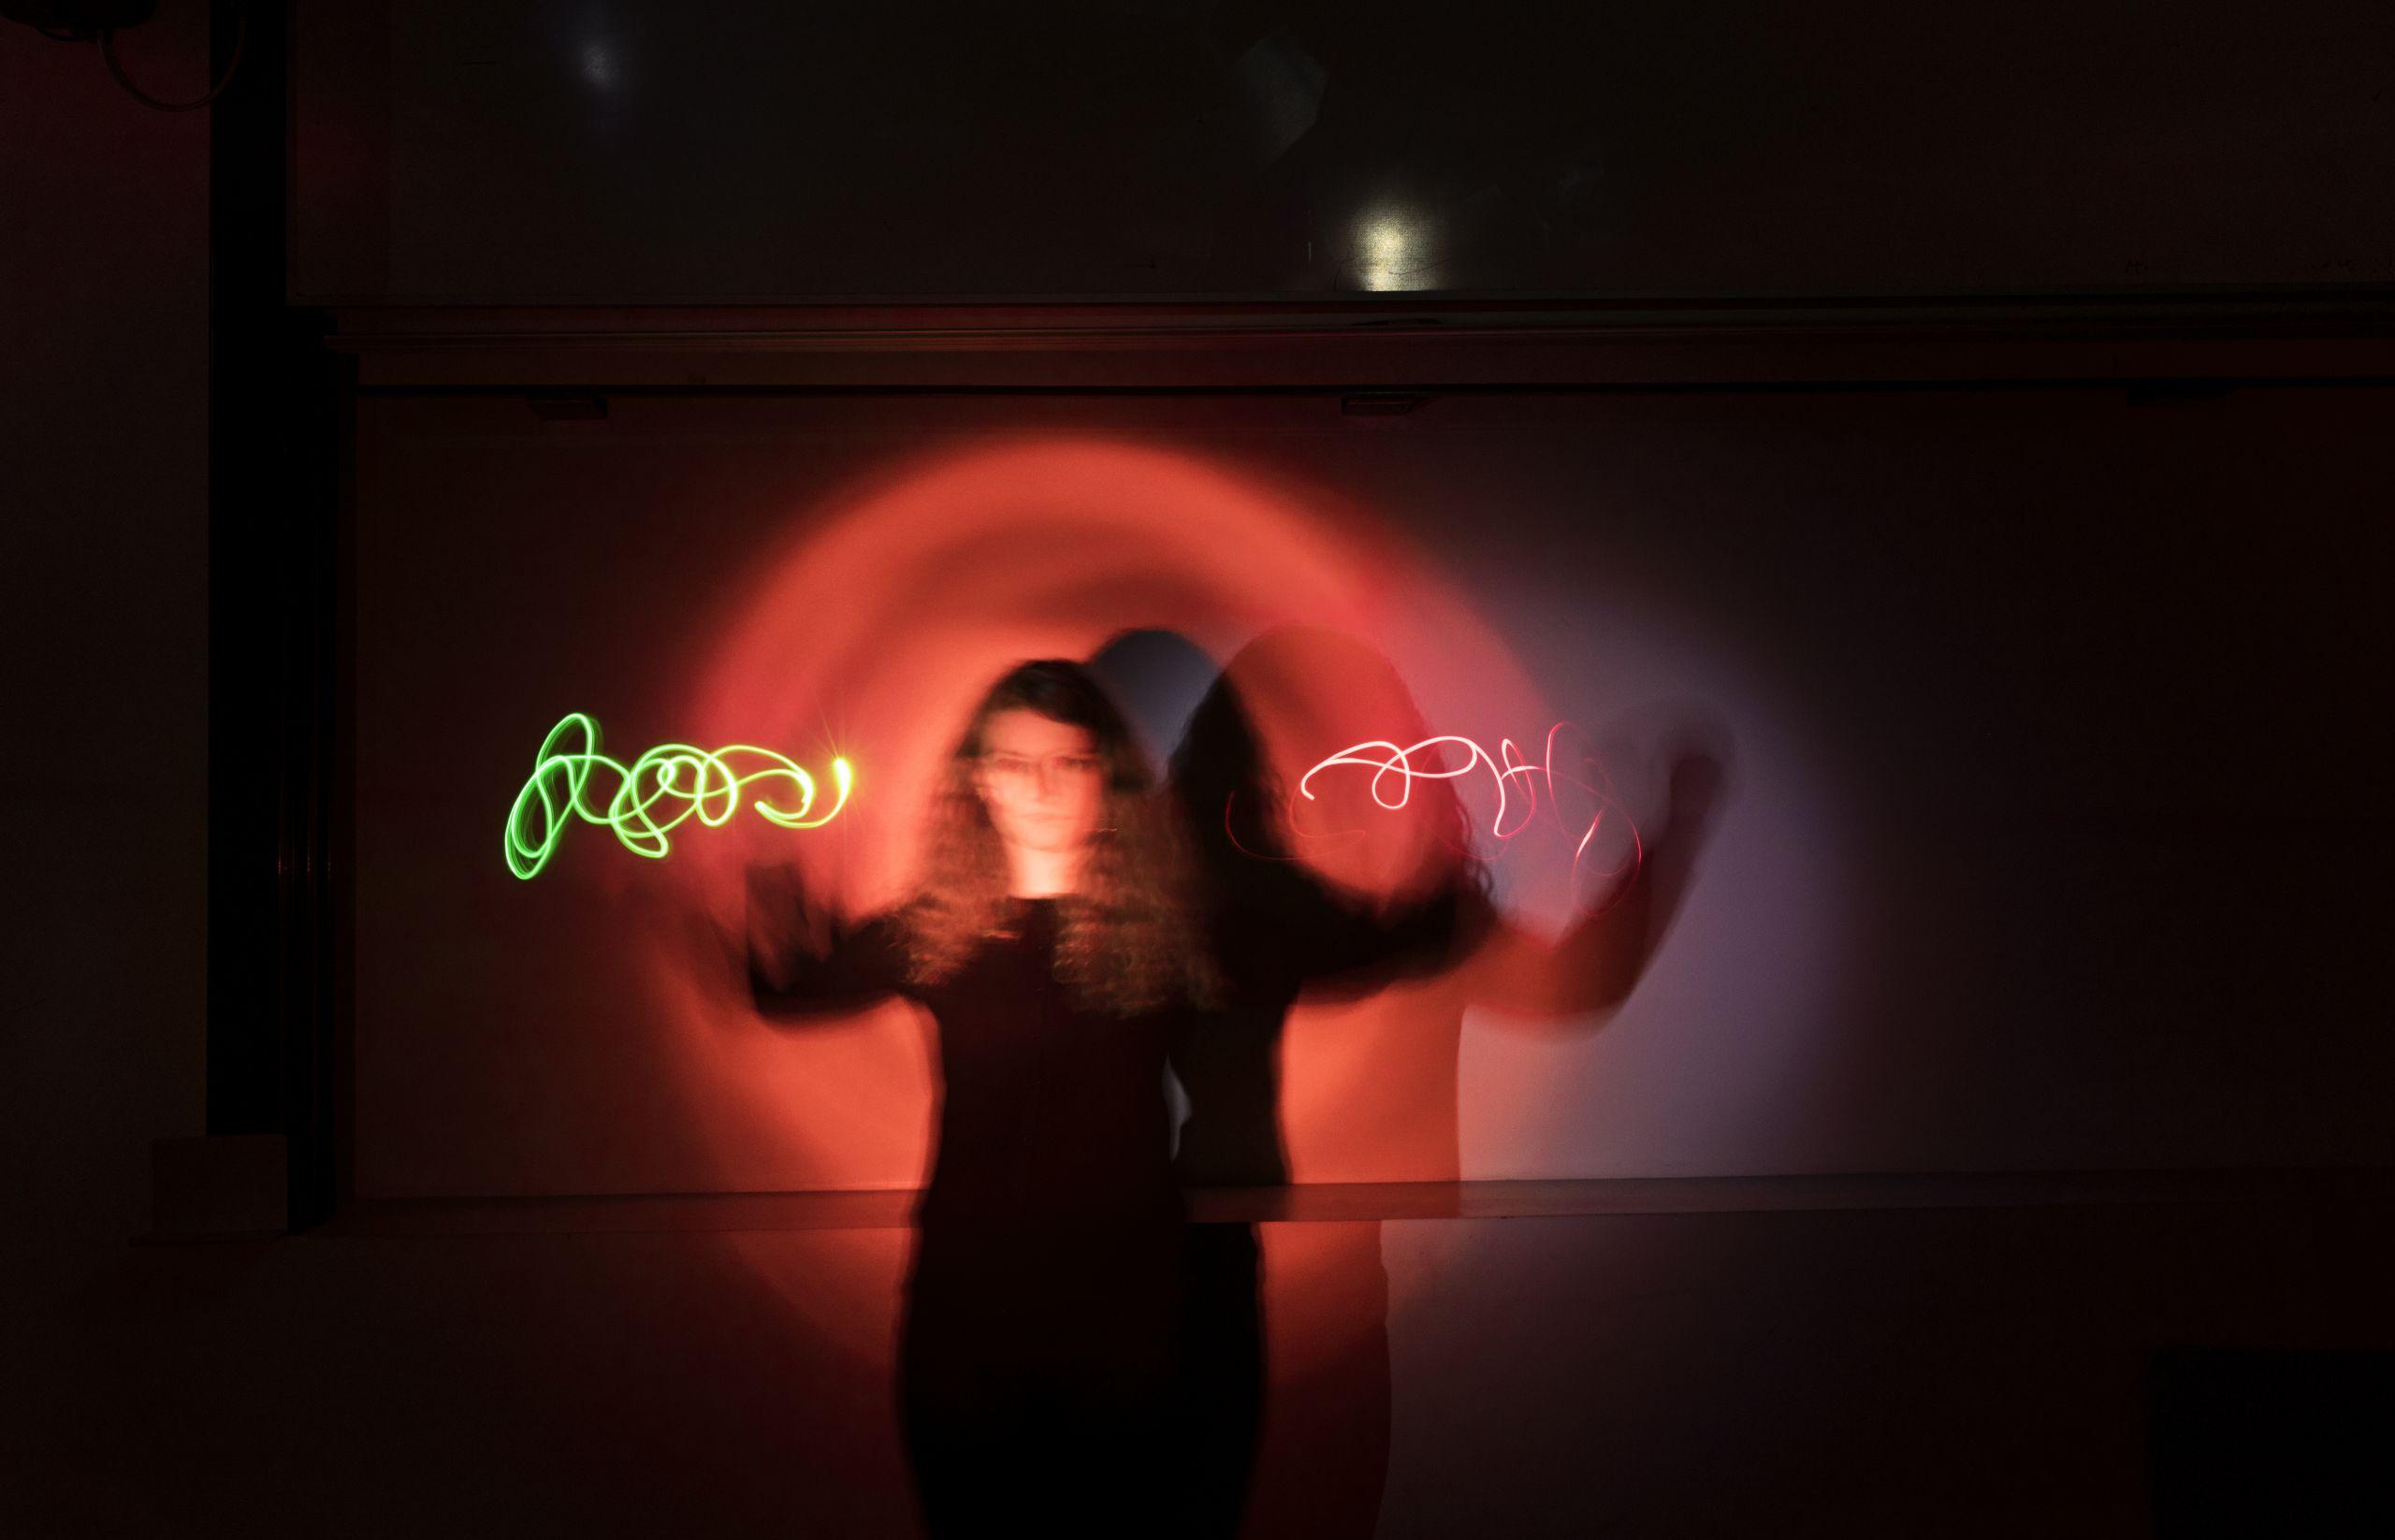 girl with swirls